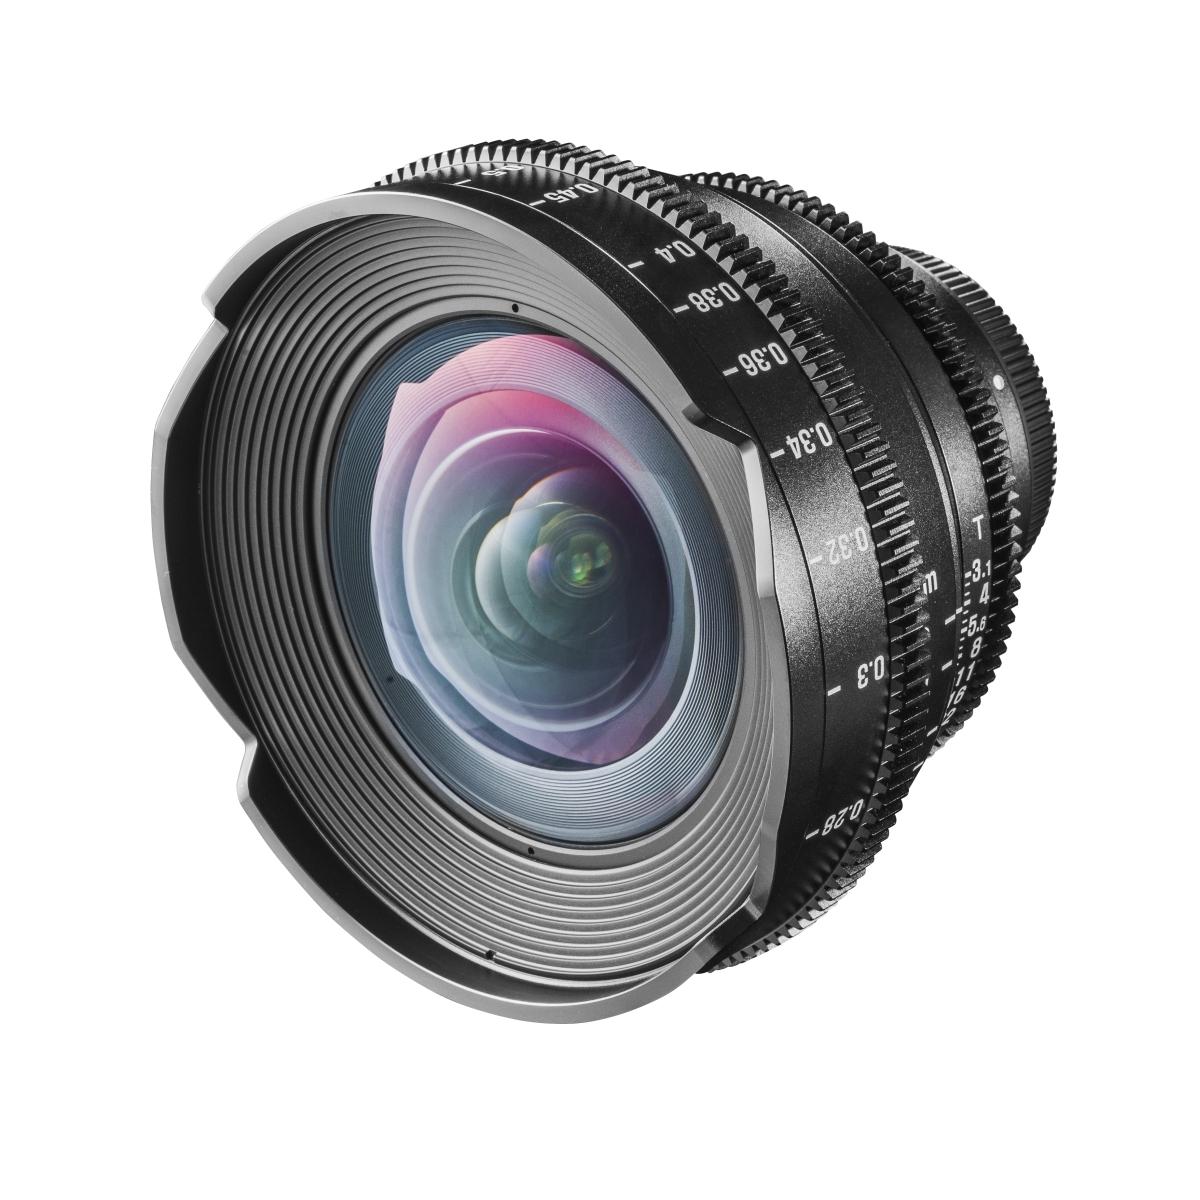 Canon Vollformat   Video - Objektiv   Objektive   Foto Walser